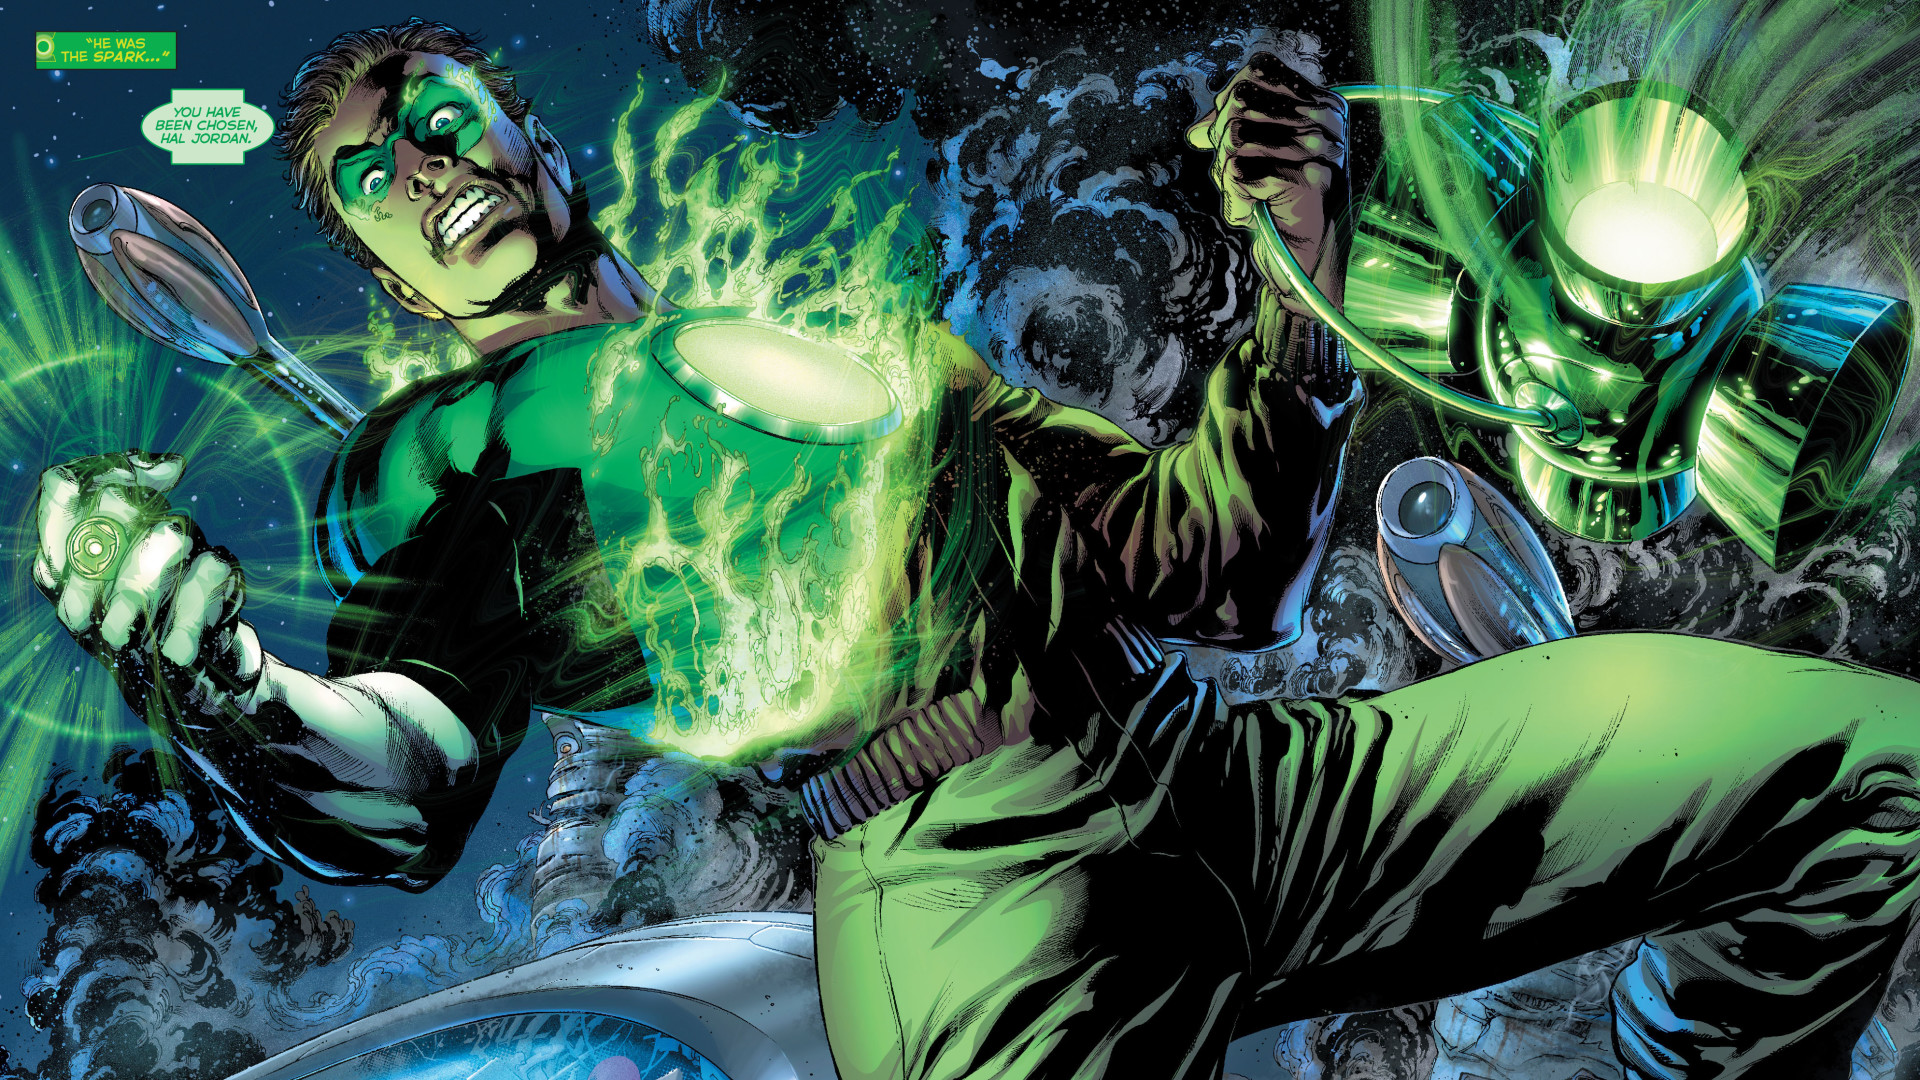 Green Lantern team Wallpapers, Green Backgrounds, Pictures and images  1920×1080 Green Lantern Wallpaper (34 Wallpapers)   Adorable Wallpapers    Pinterest …